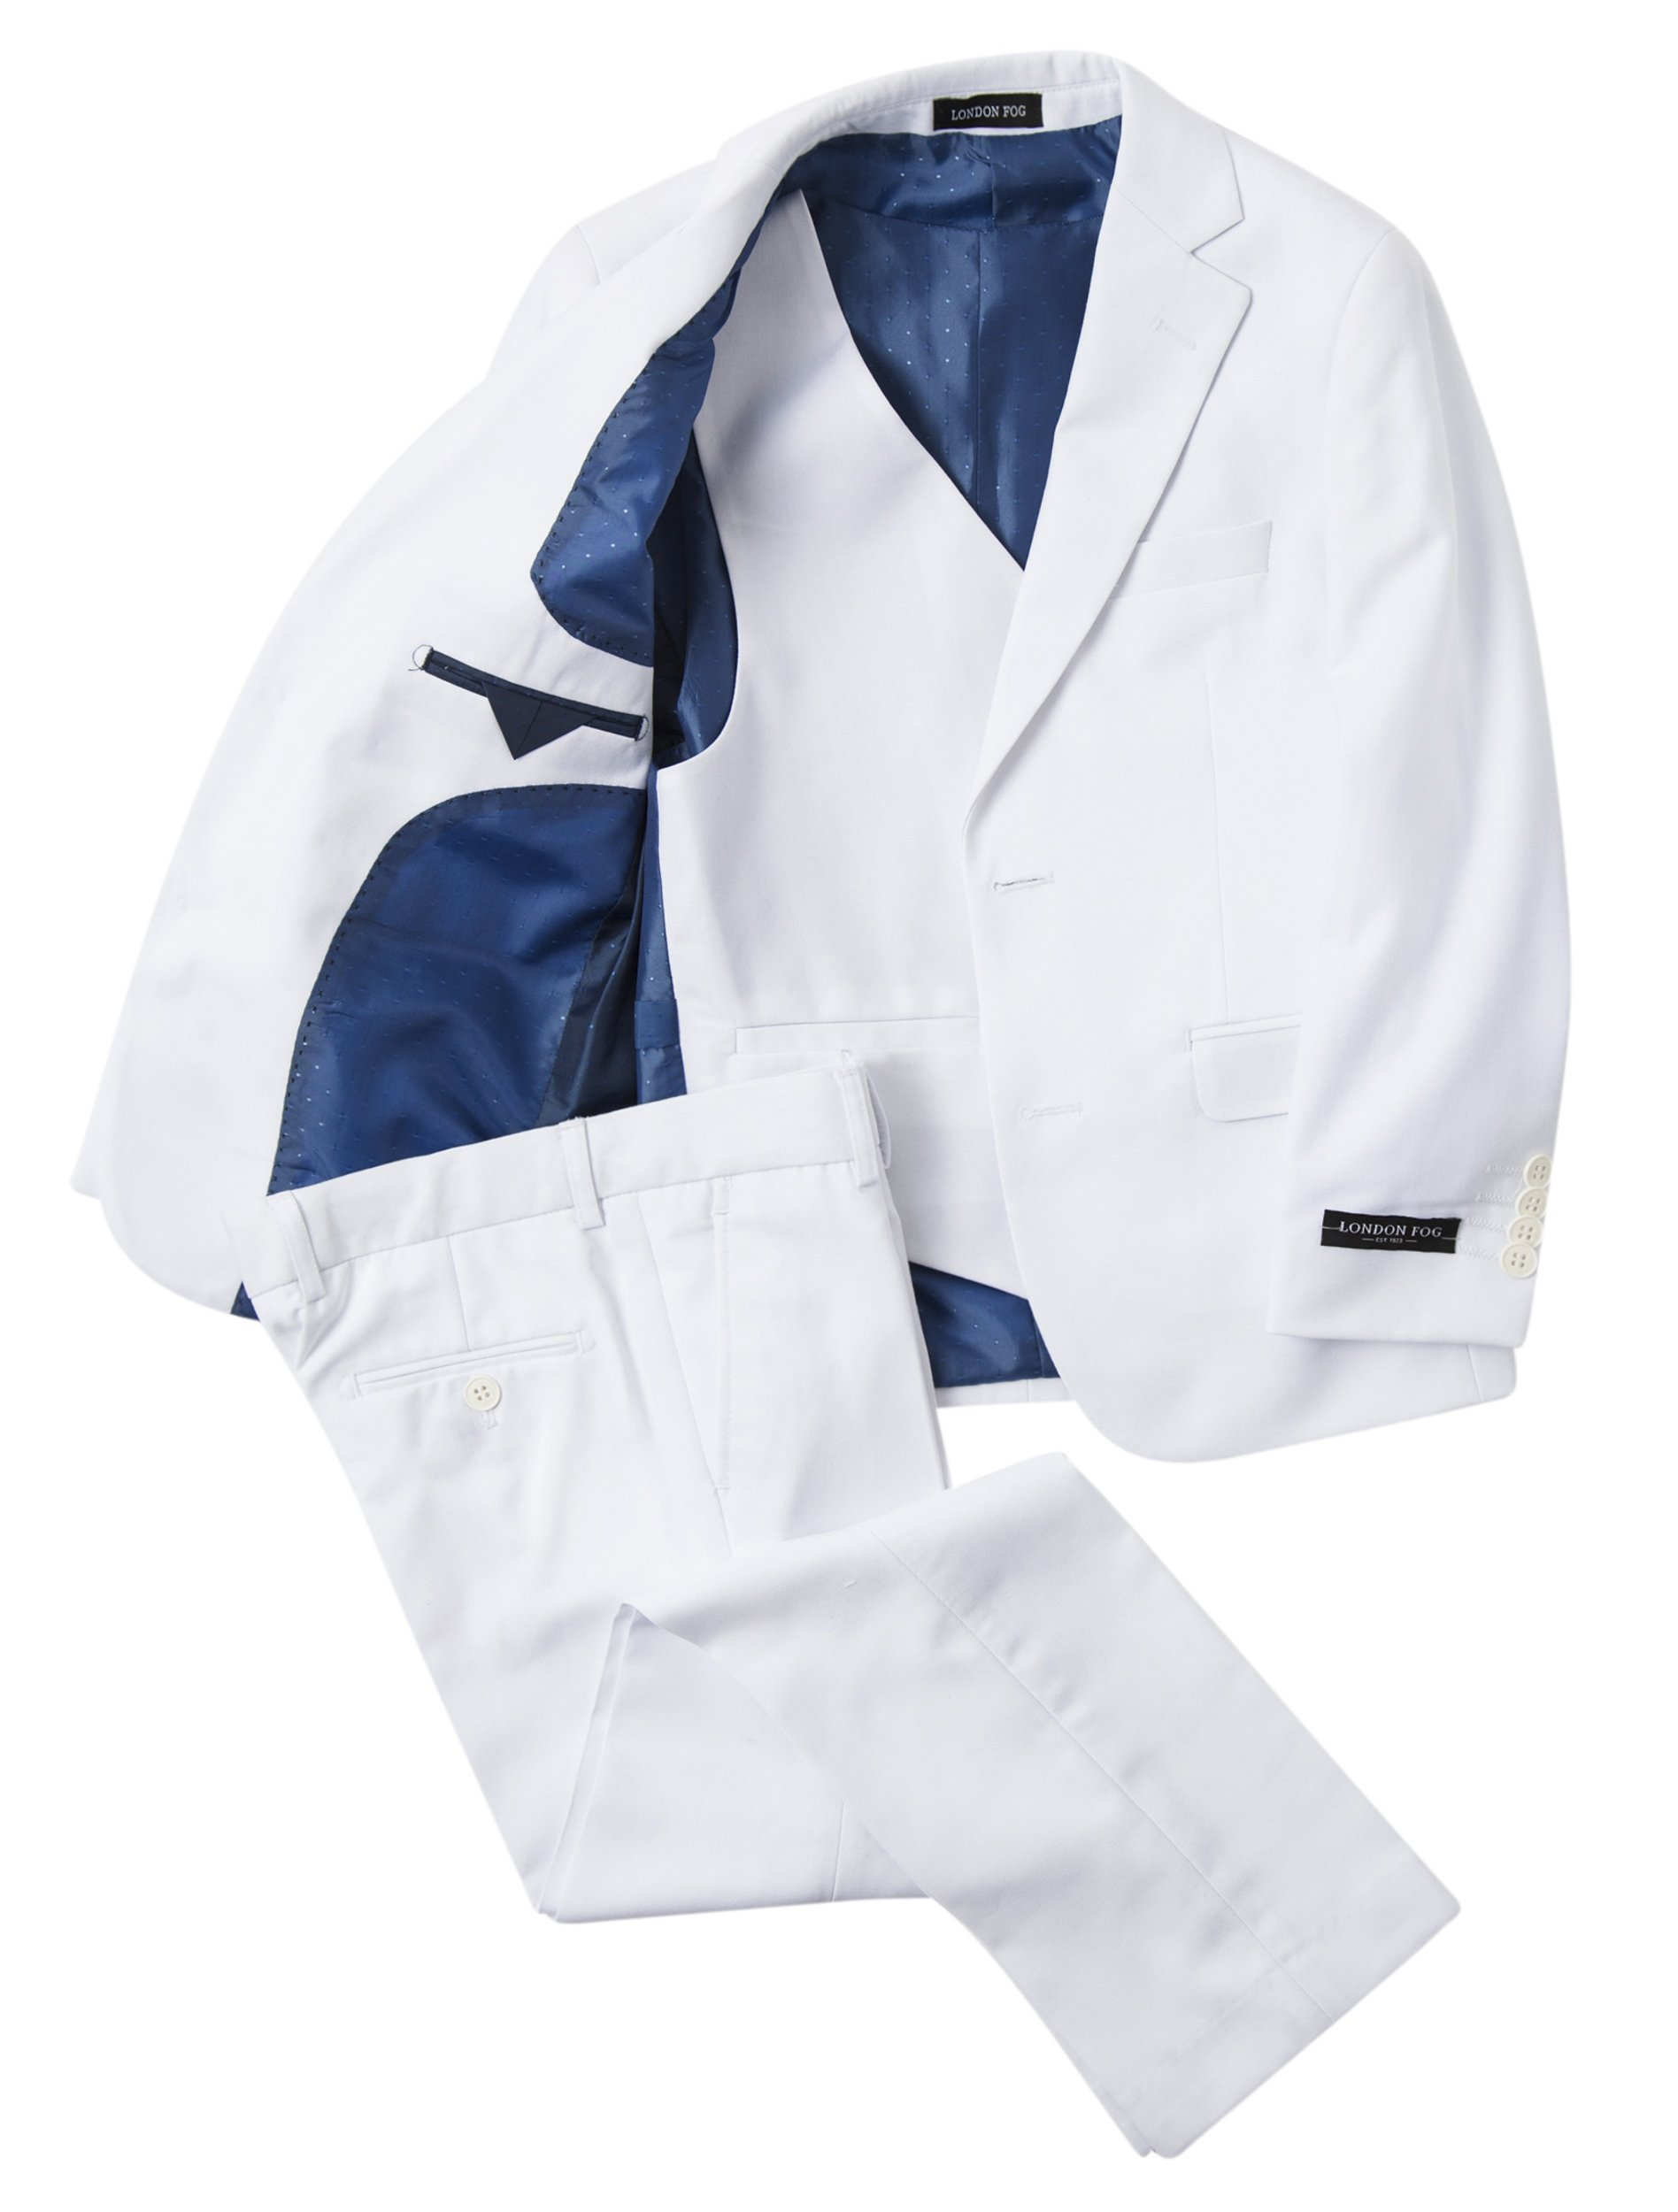 London Fog Boy's Modern Fit 3-Piece Formal Luxury Suit Set - White - 8